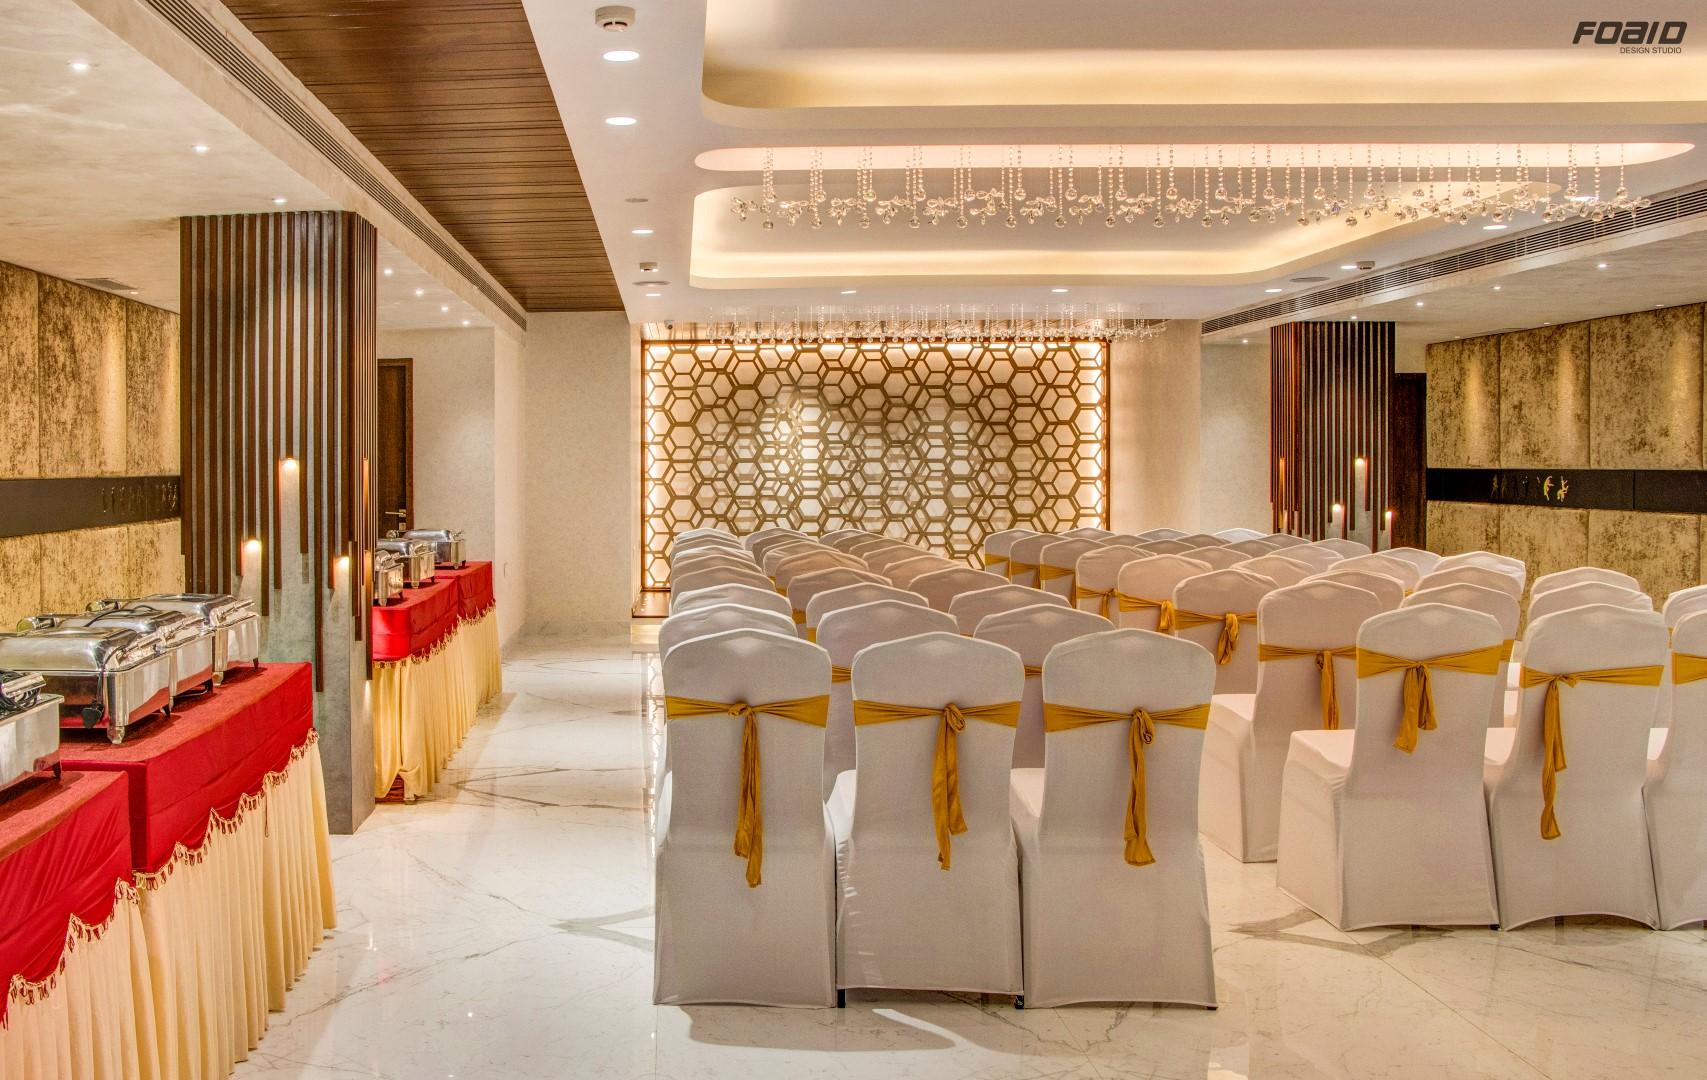 indian function hall design low budget interior design